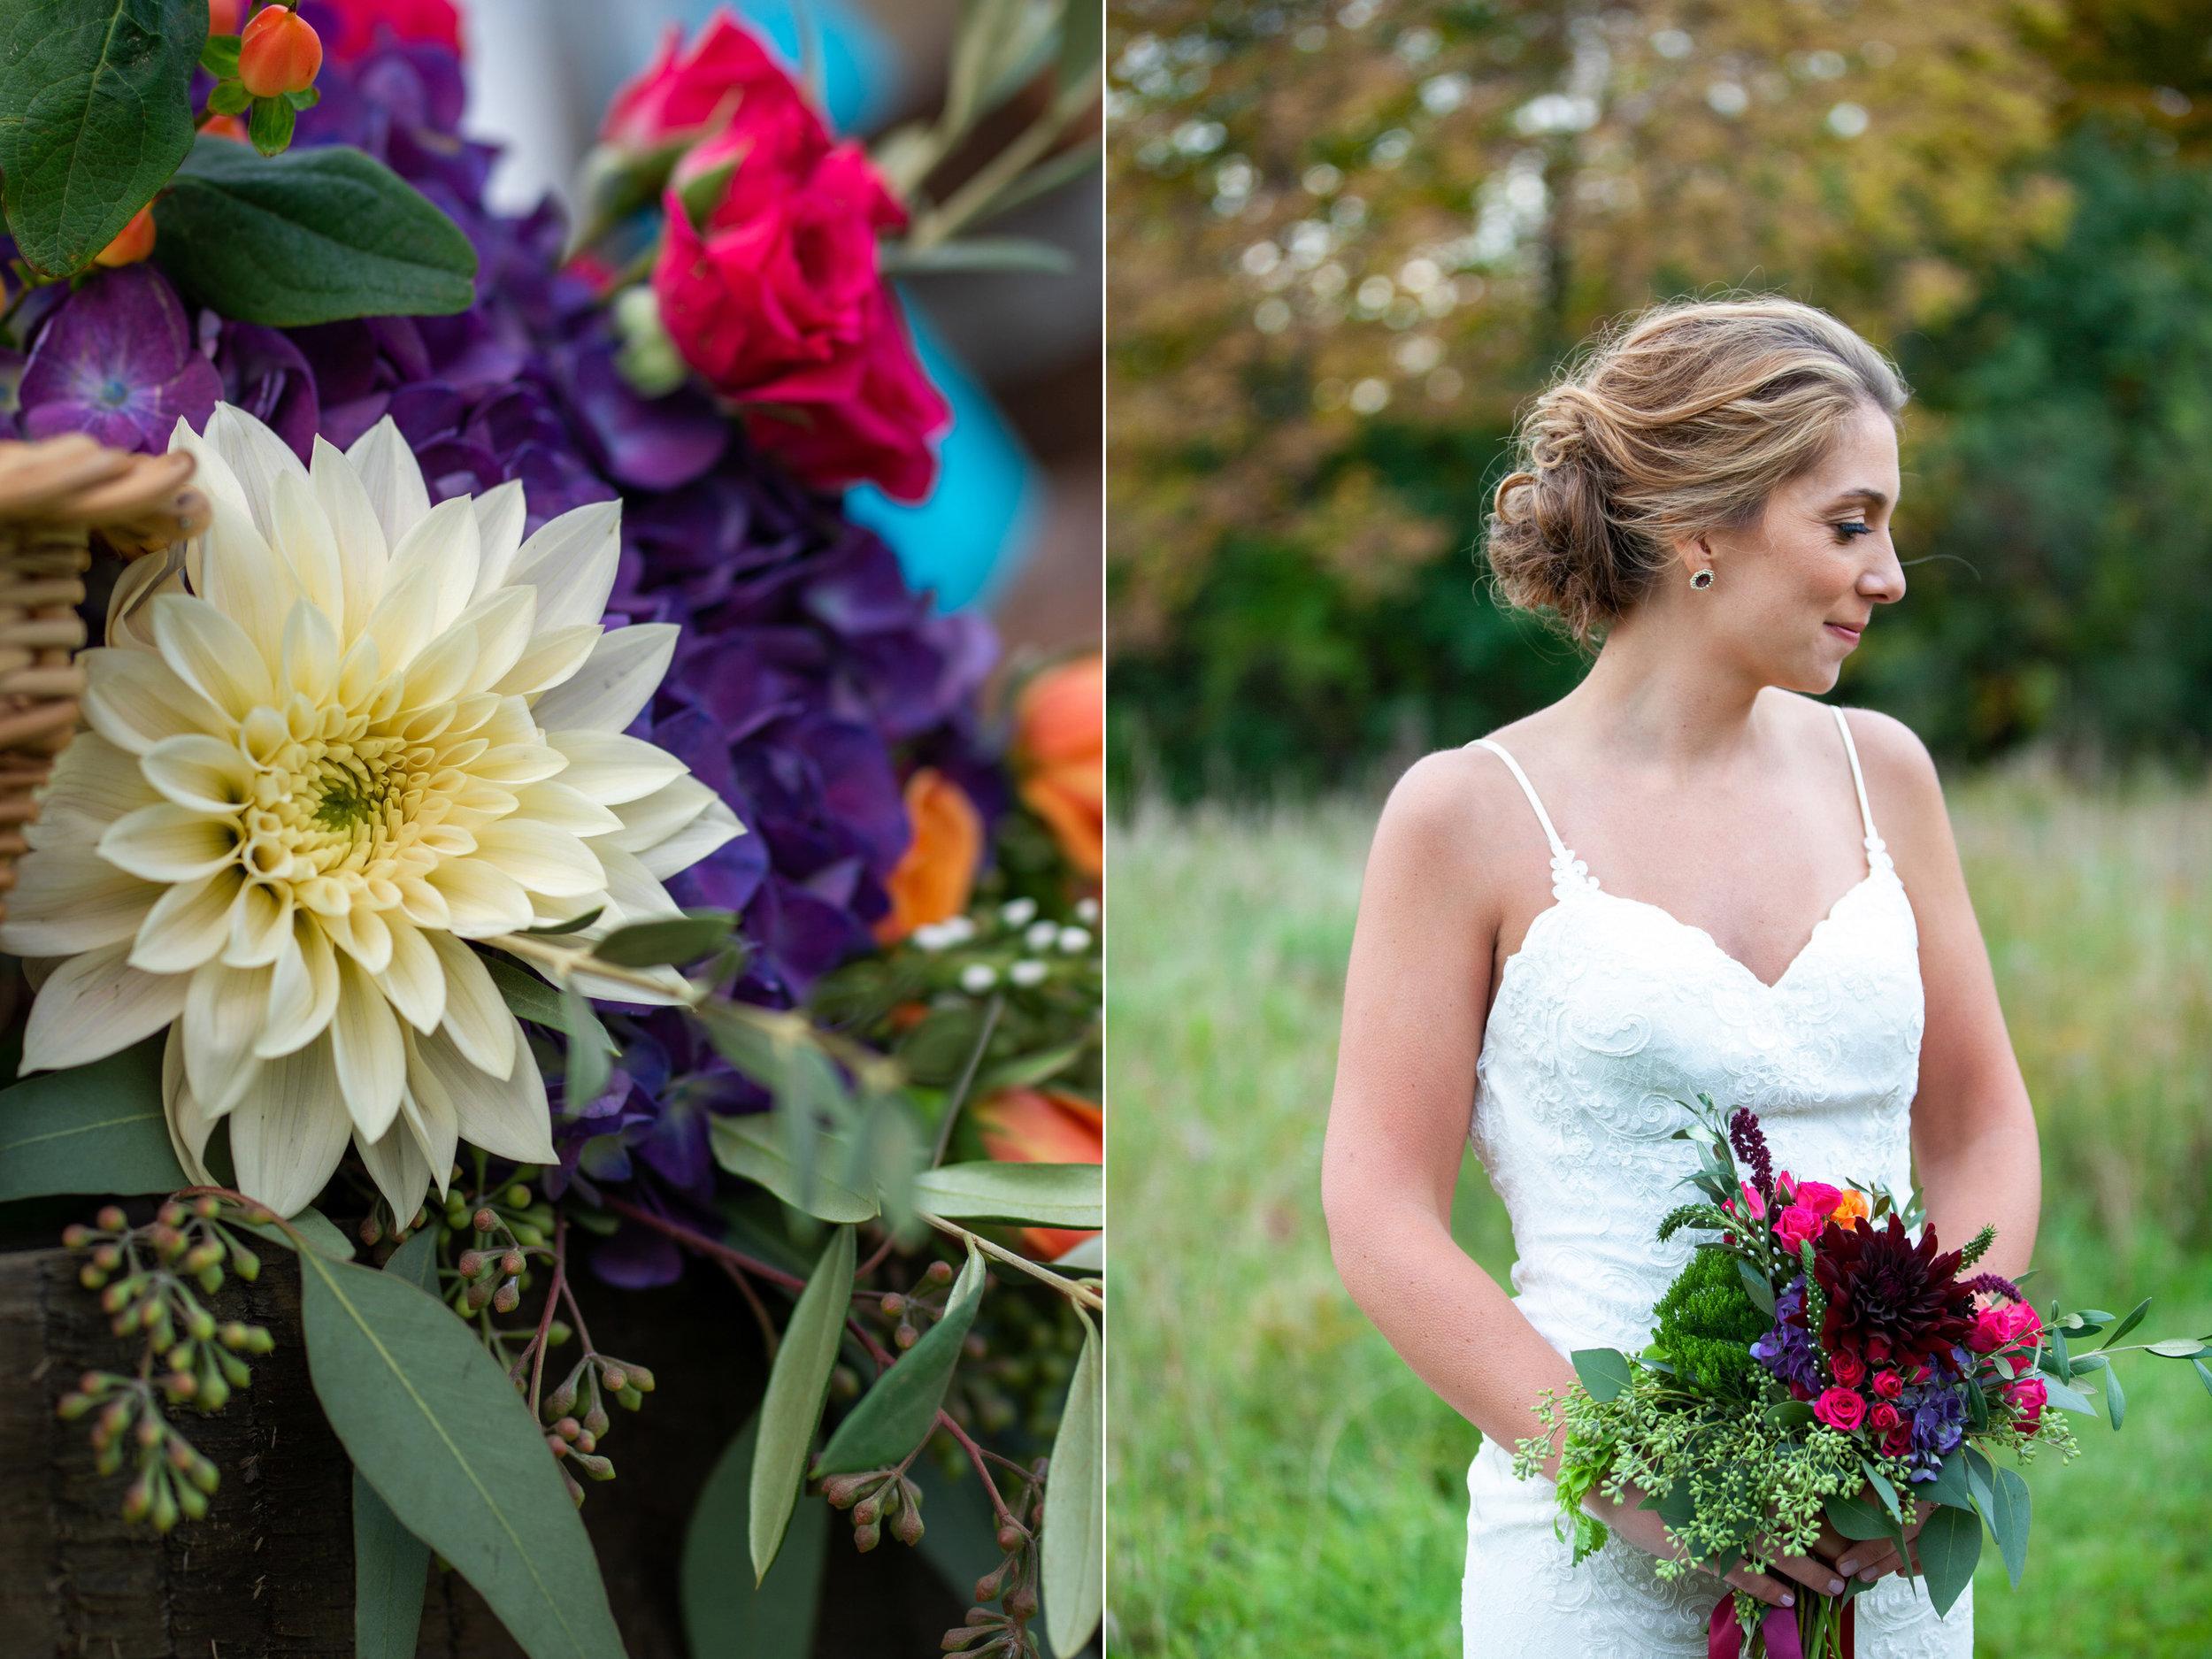 maine-farm-wedding-photographer-stepheneycollins-261b.jpg